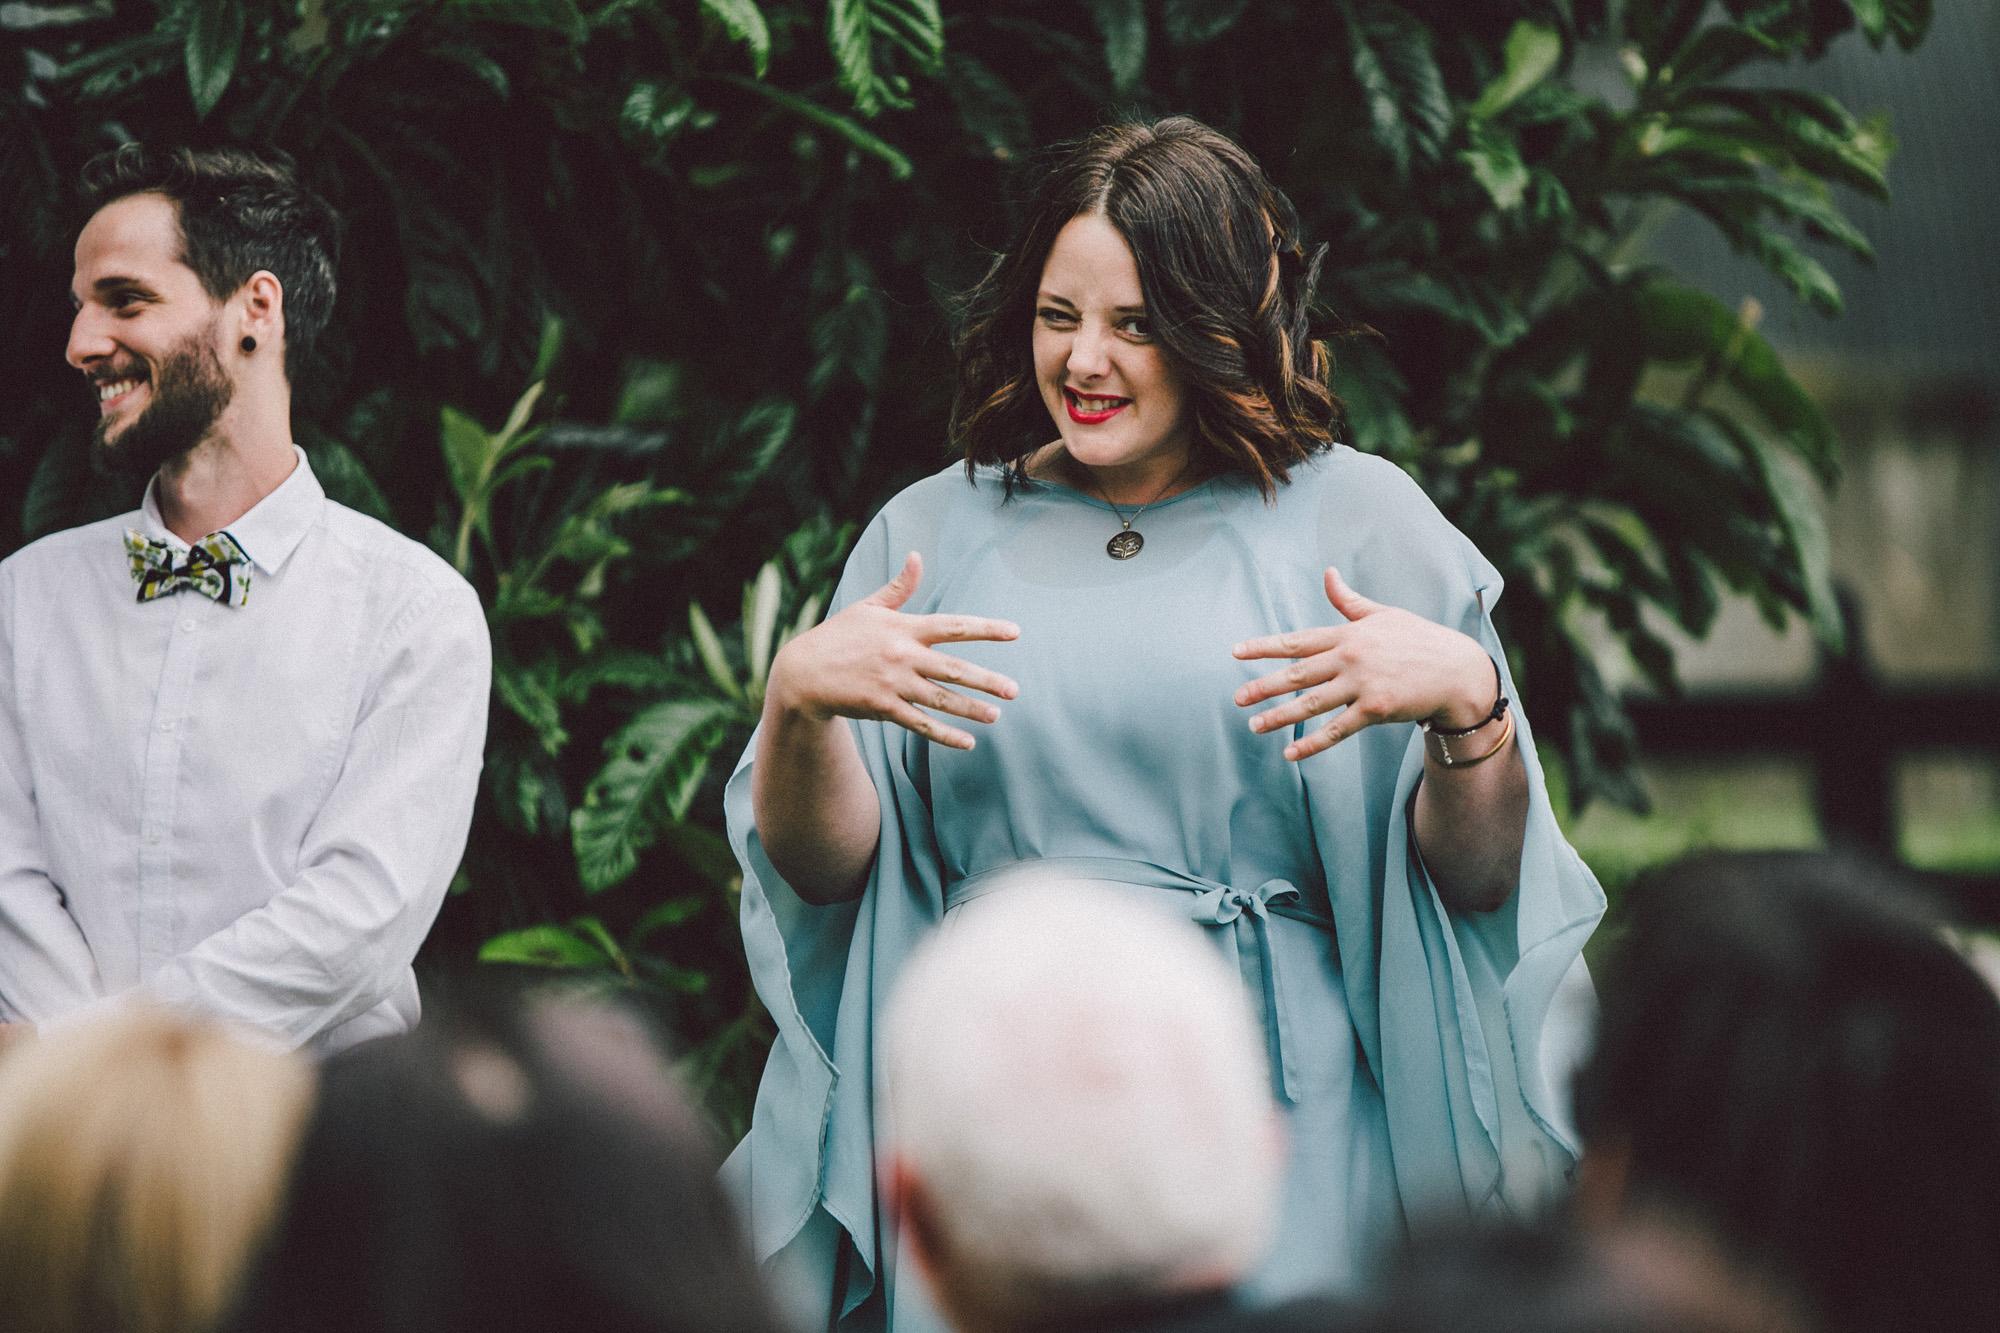 McEvoy_Palmerston_North_Wedding_031.jpg